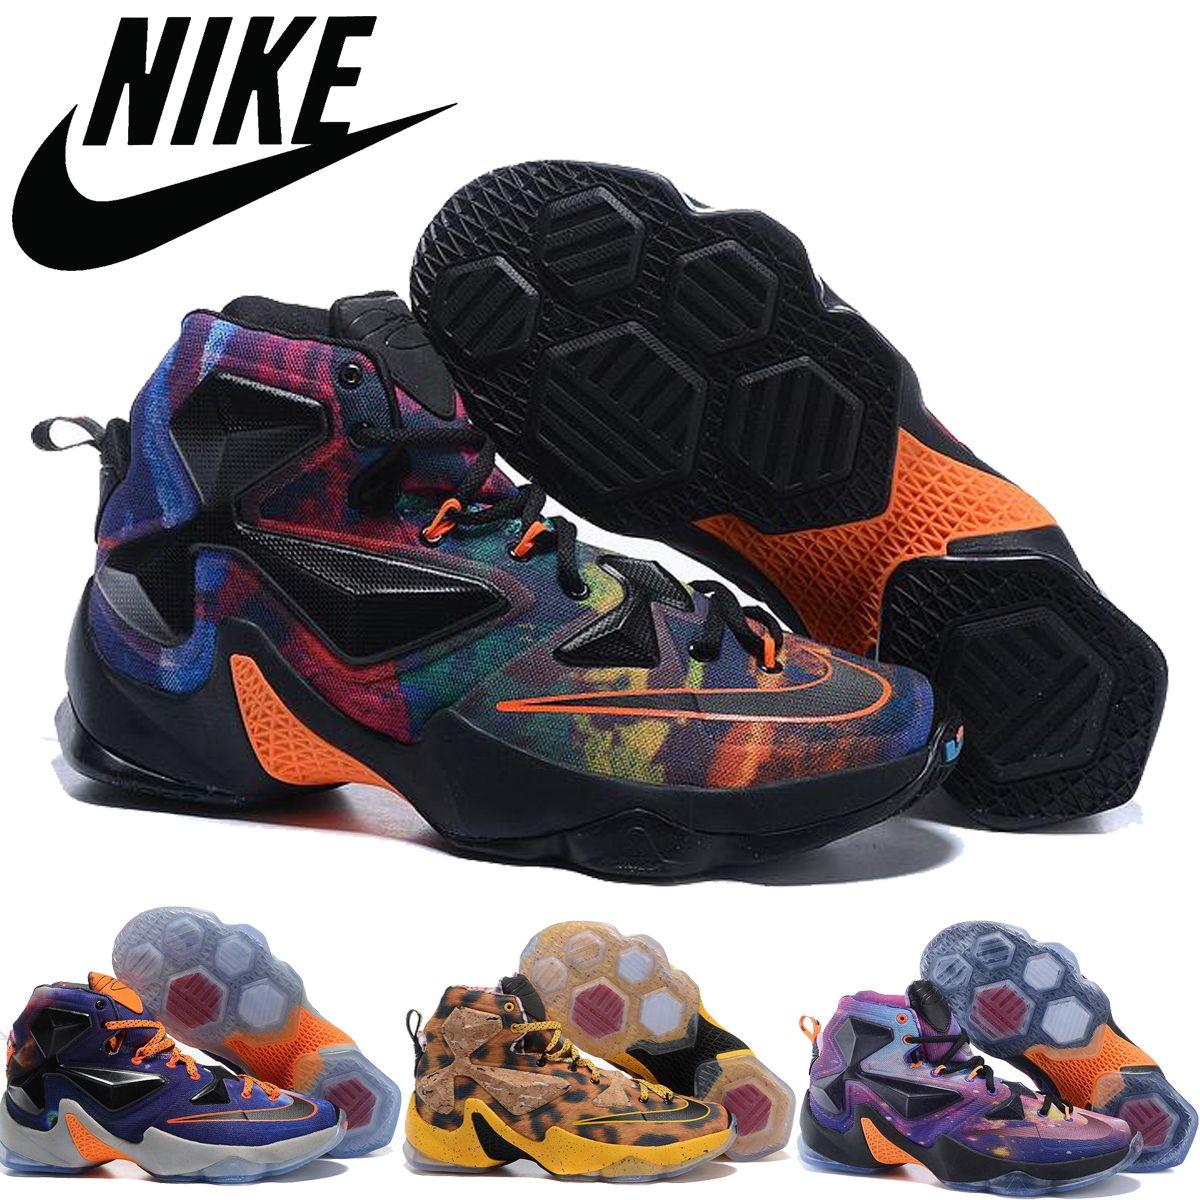 newest 7fe39 51823 Acquista Nike Lebron 13 Xiii Horror Venerdì 13 Sangue Splatter Bianco Rosso  Università 807219 106 Mens Lebrons James Di Pallacanestro Scarpe Da  Ginnastica A ...